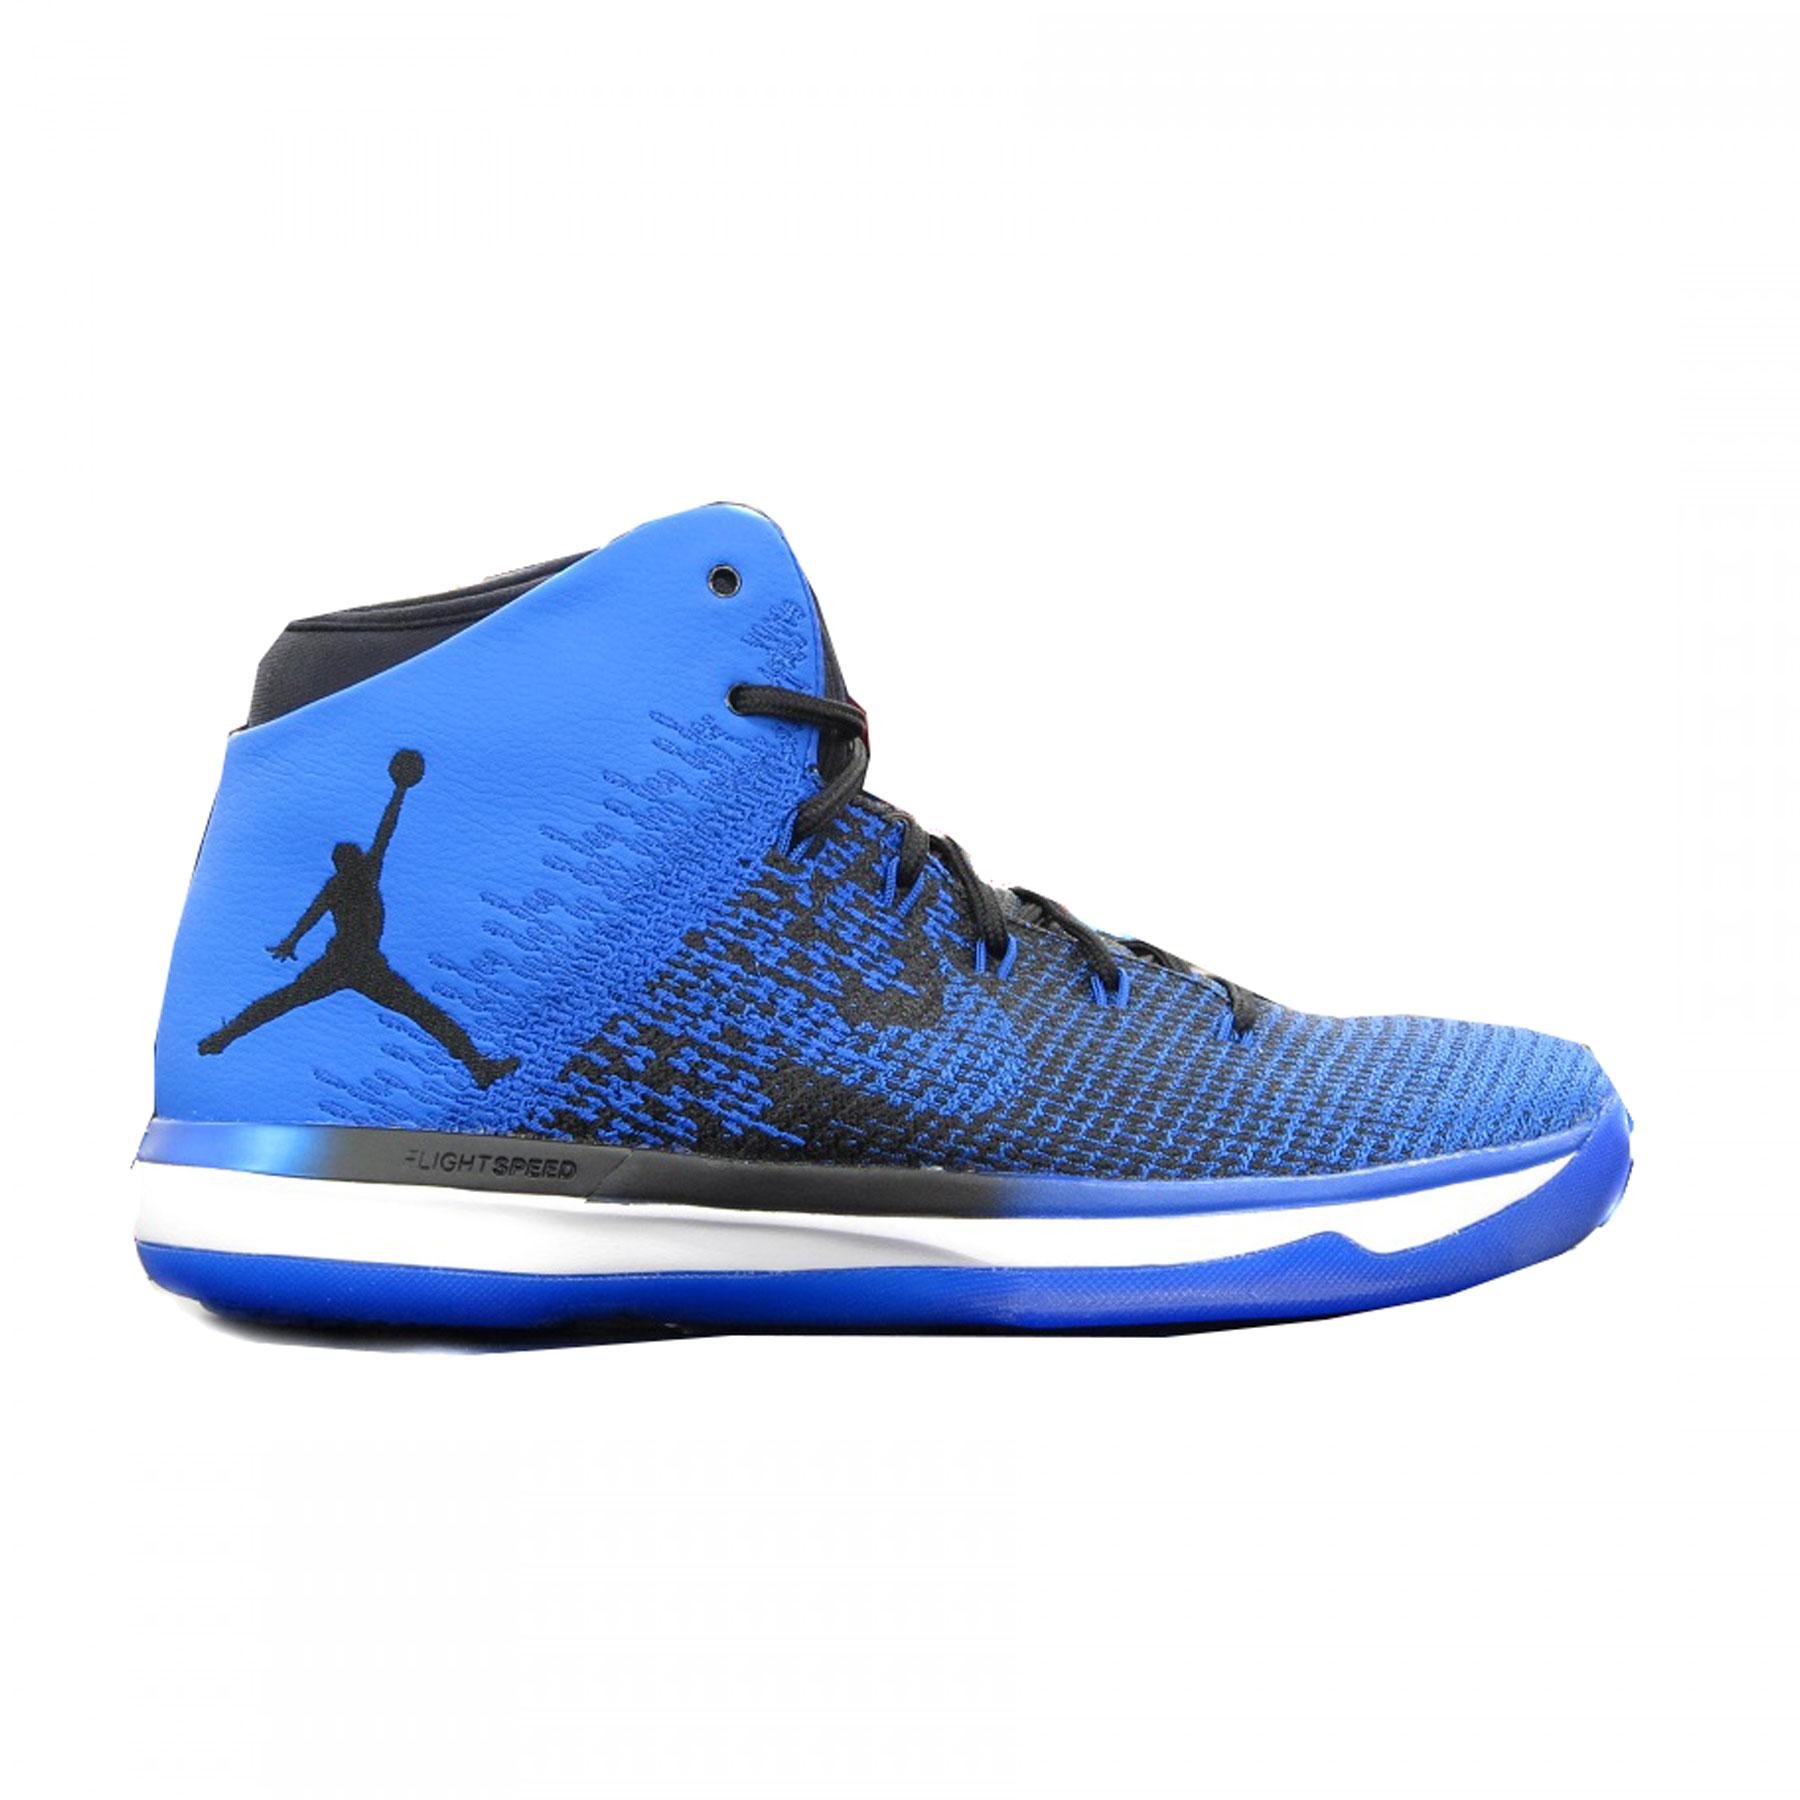 info for 21d6f 5727b Air Nike 6 Retro Offerte Gg amp  Scarpe Prezzi Migliori Jordan Low RTxwRg